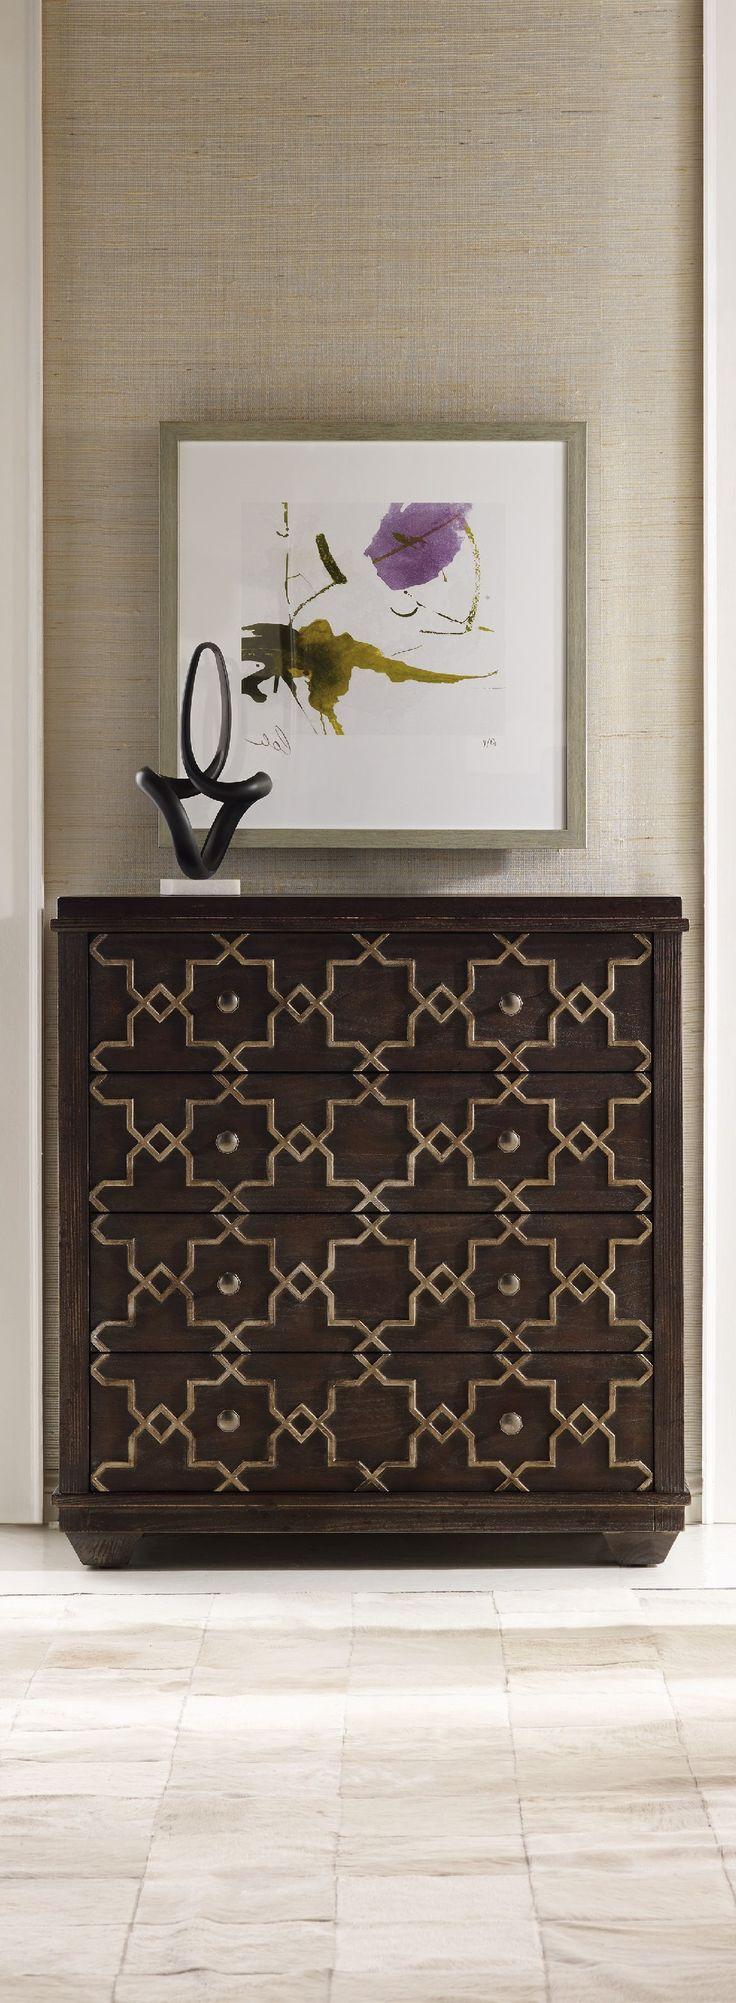 LUXURY FURNITURE | Love this chest of drawers! | www.bocadolobo.com/ #luxuryfurniture #designfurniture